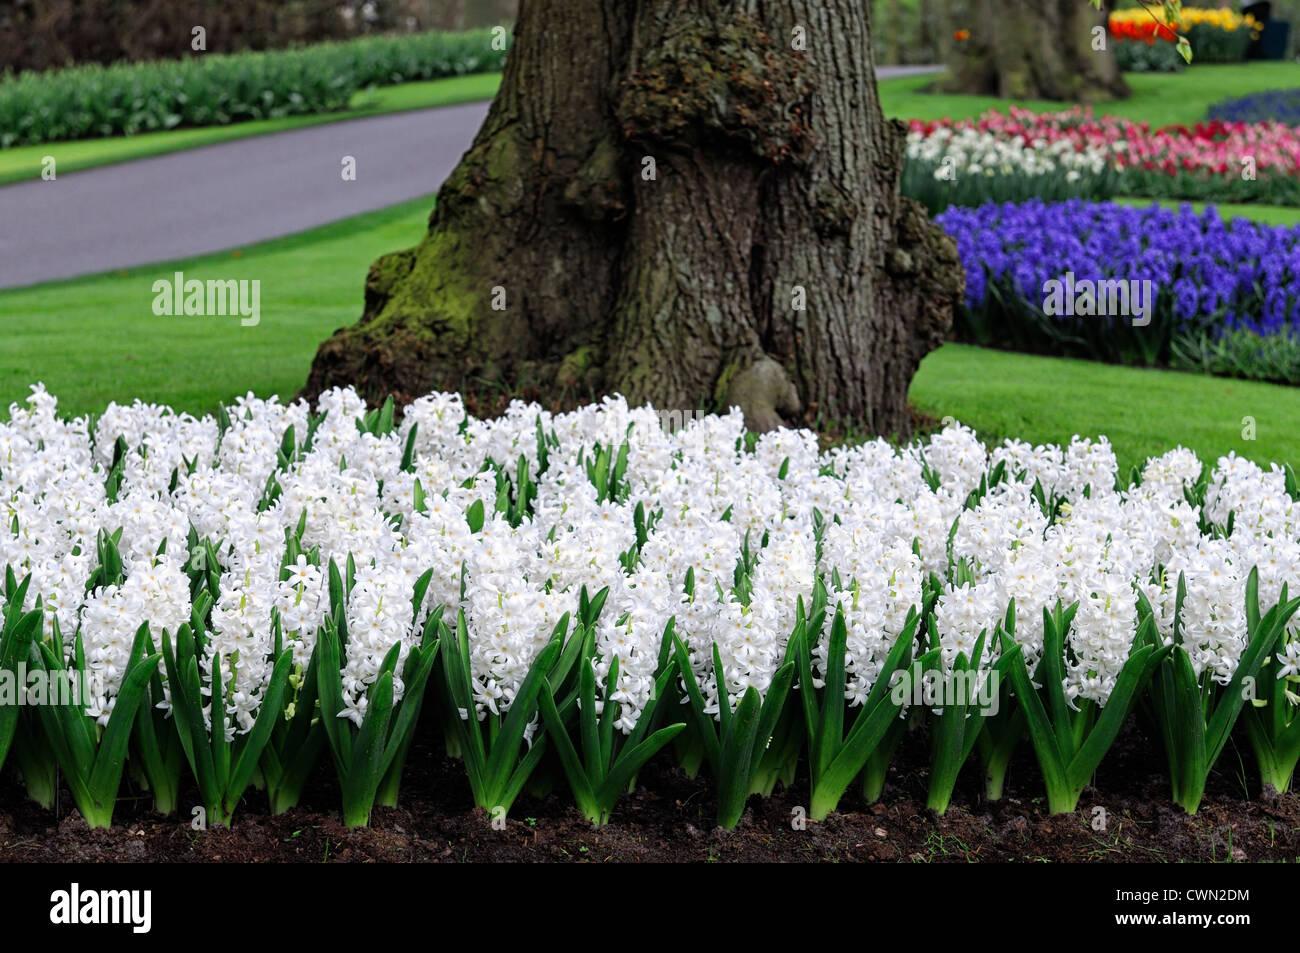 Hyacinth hyacinthus orientalis carnegie white flower flowers blooms hyacinth hyacinthus orientalis carnegie white flower flowers blooms blossoms bed beds border spring bulb display displays mightylinksfo